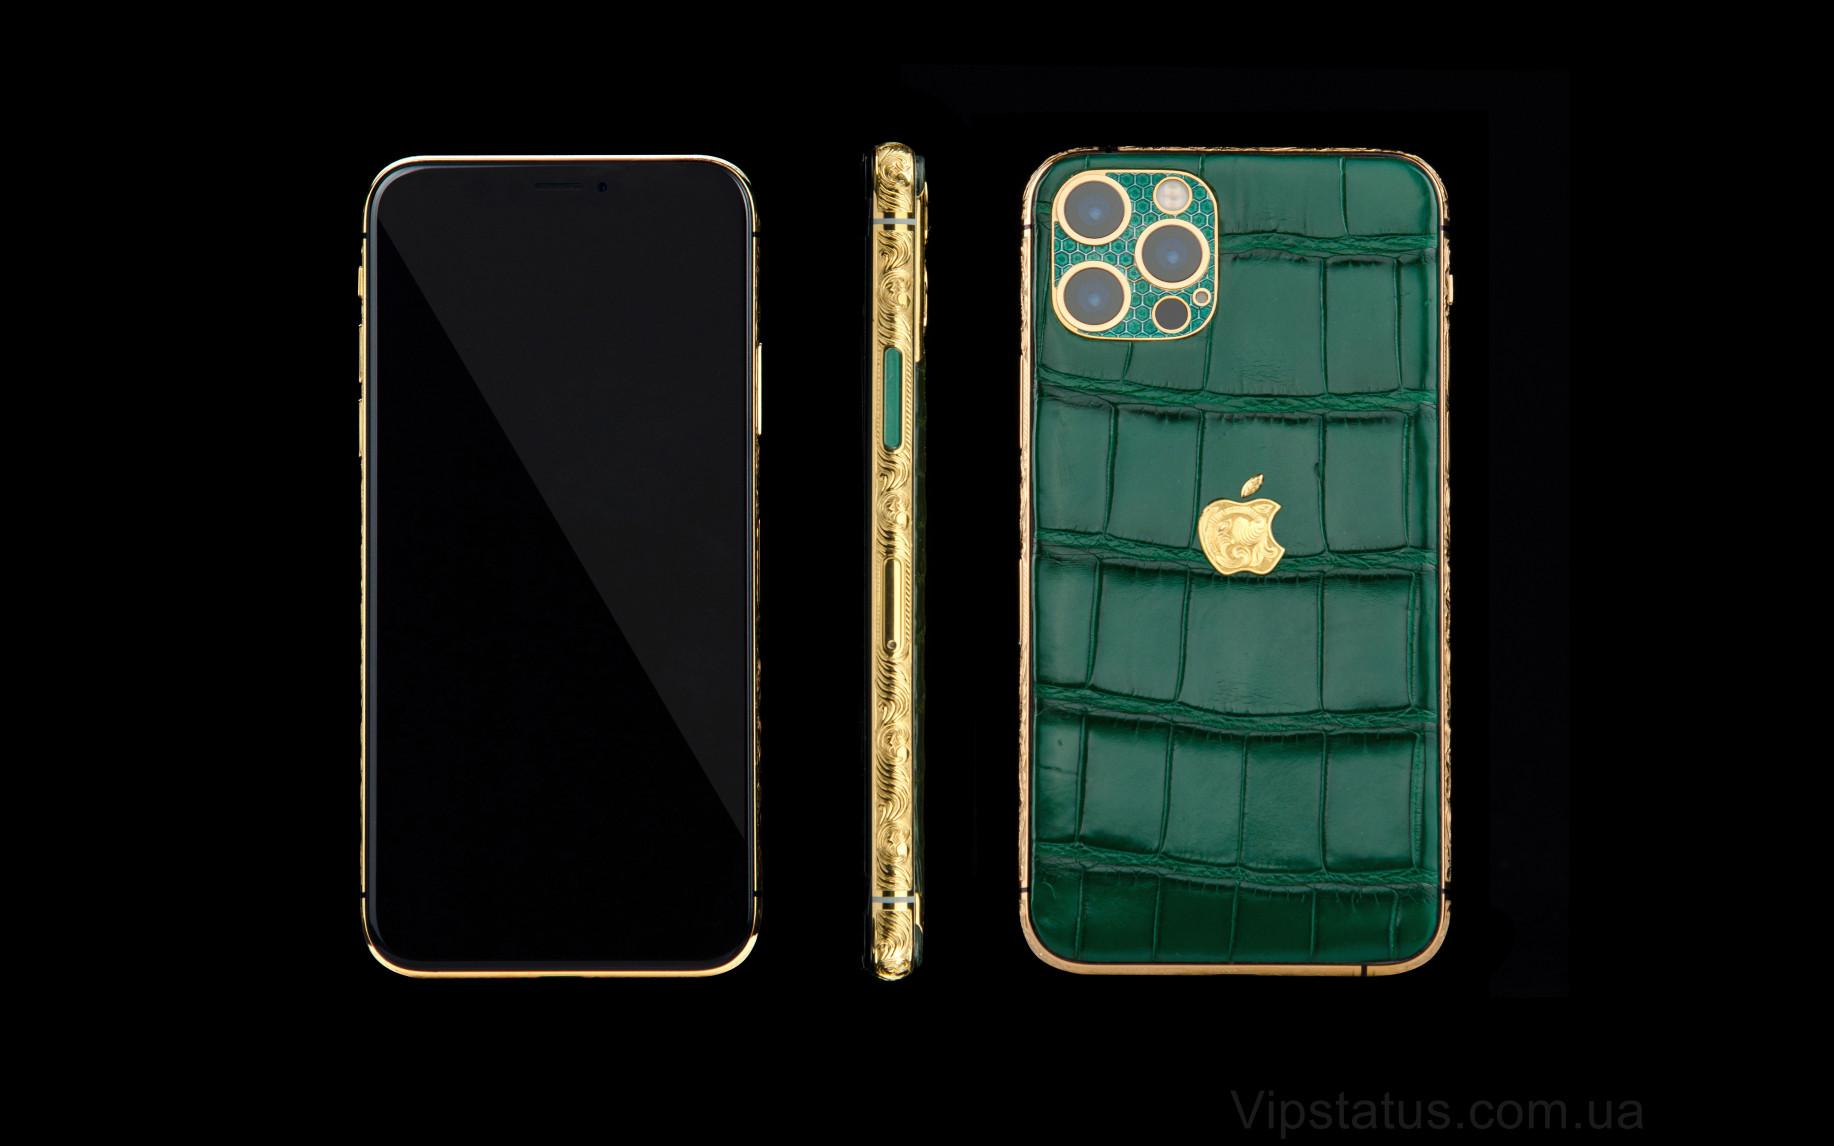 Elite Green Power IPHONE 12 PRO MAX 512 GB Green Power IPHONE 12 PRO MAX 512 GB image 5